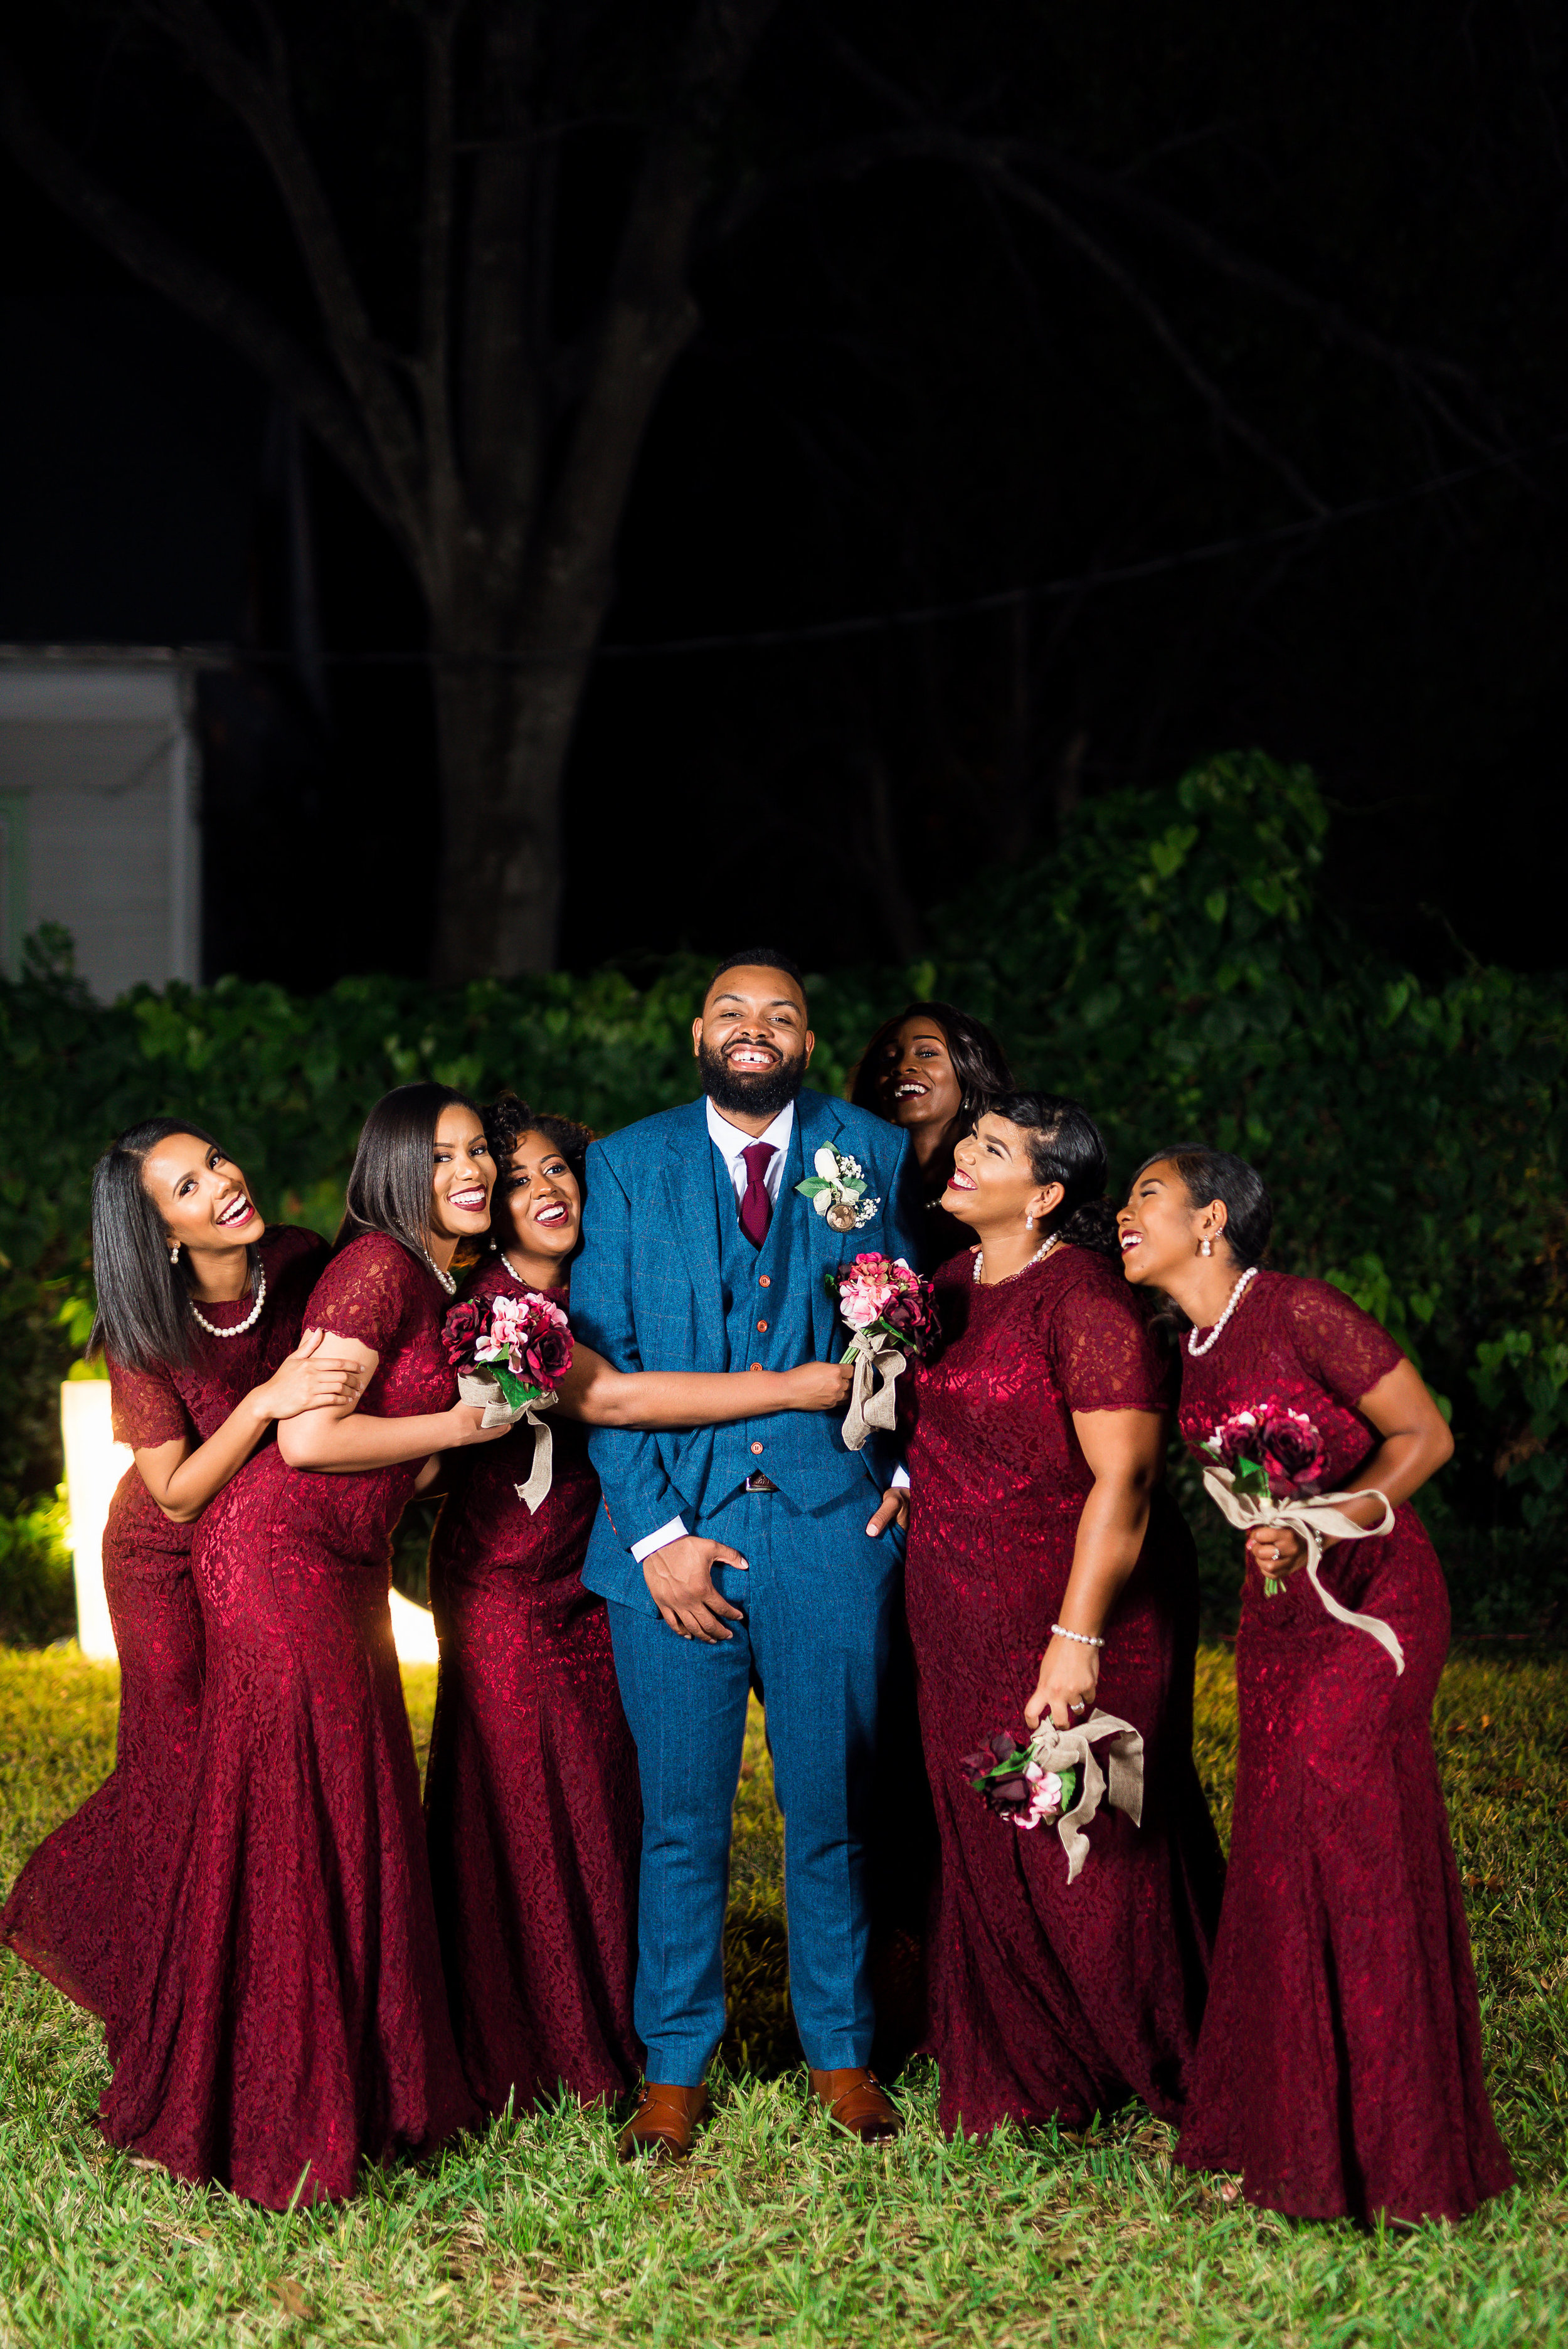 TC-Jessica-Garr-Pharris-Photography-Real-Wedding-31.jpg